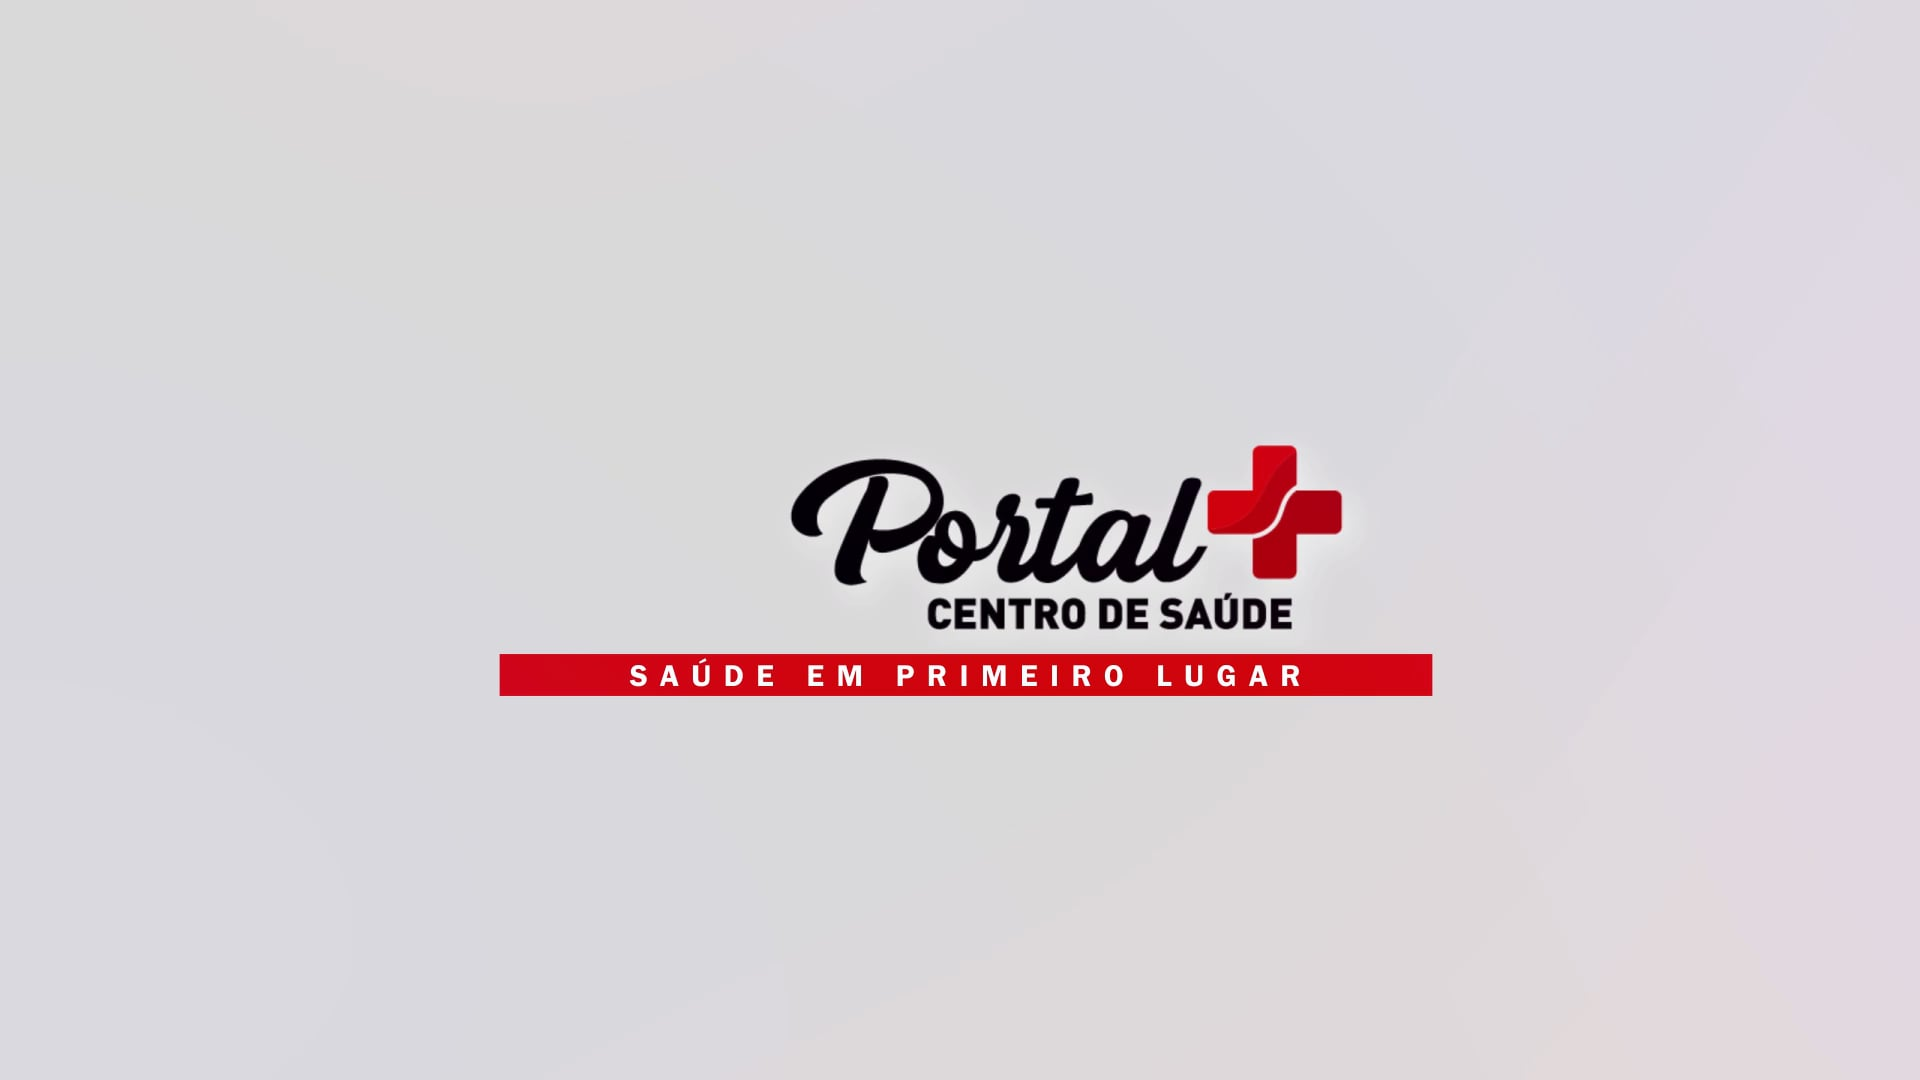 Clínica Portal mais Saúde - | Agência Síntese |